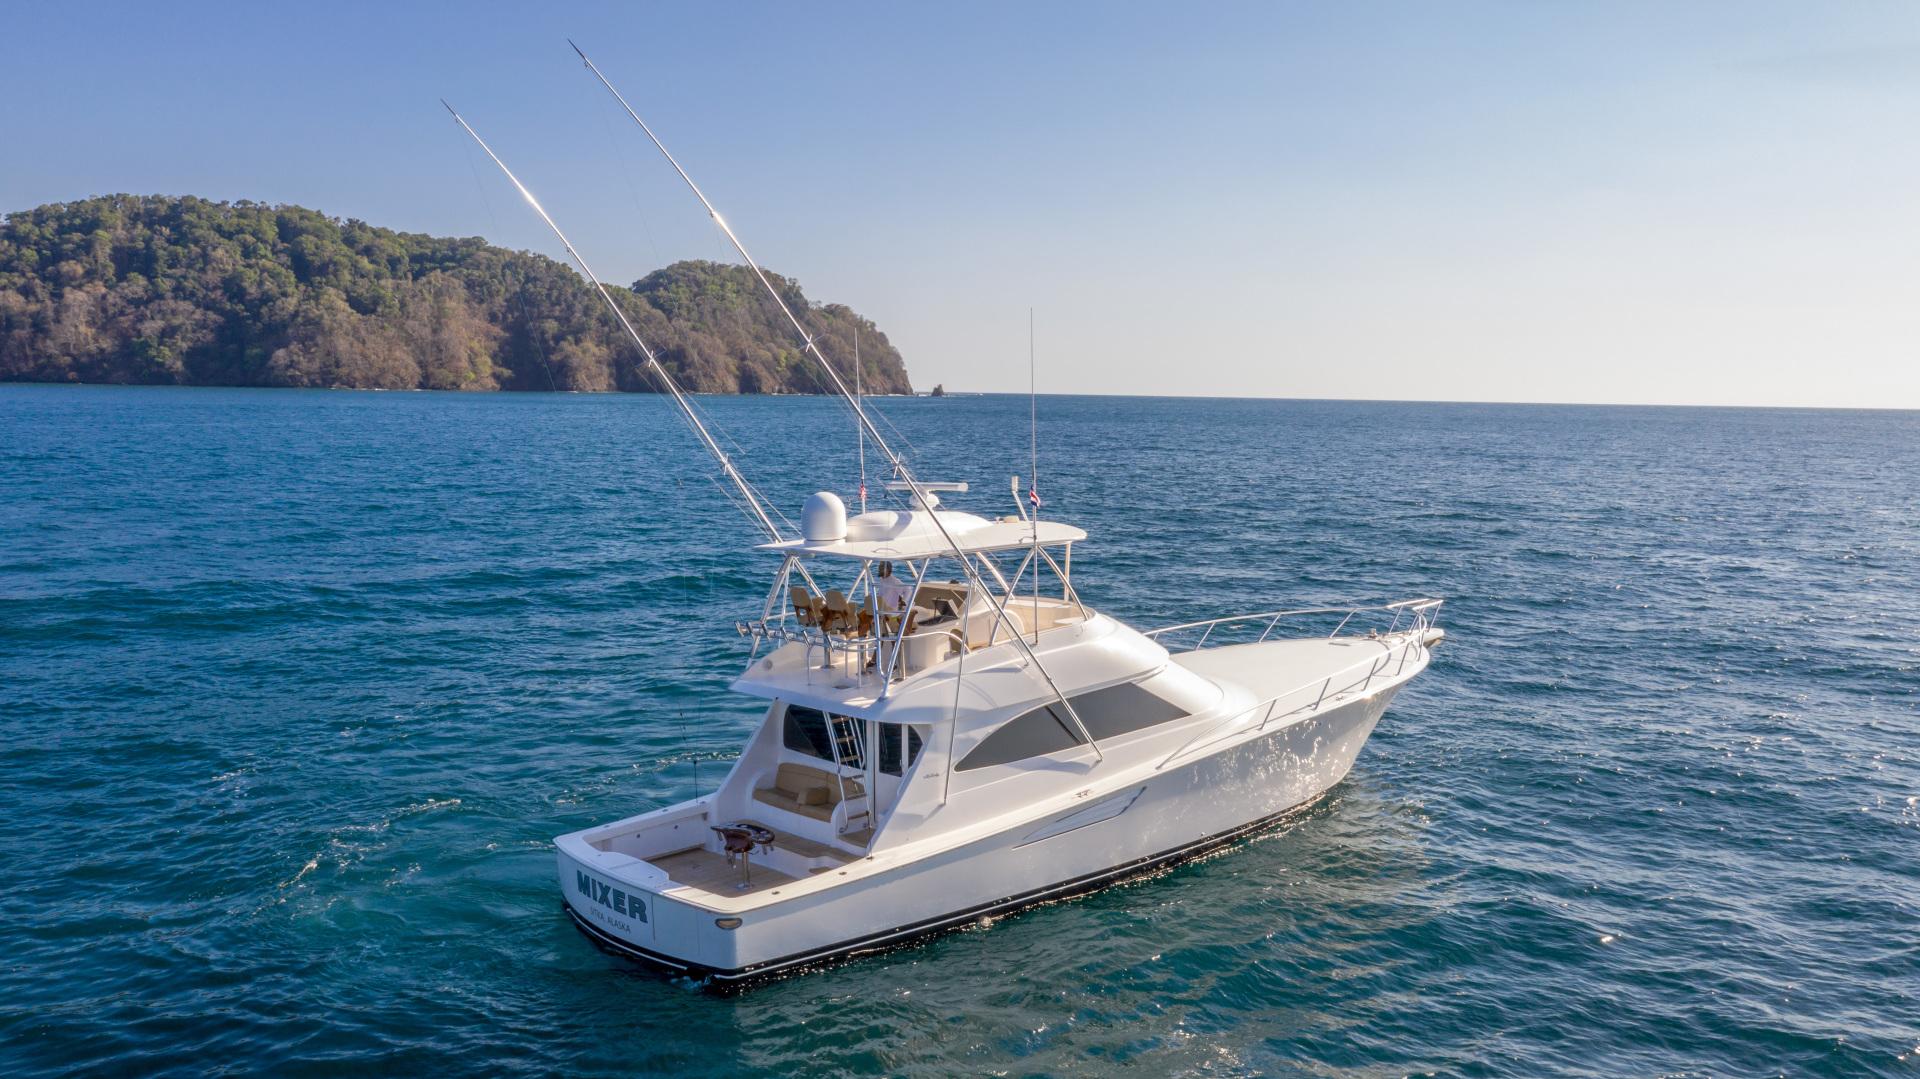 Viking-62 Convertible 2014-Mixer Playa Herradura, Los Suenos,-Costa Rica-2014 Viking 62 Convertible  Starboard Profile-1356265 | Thumbnail